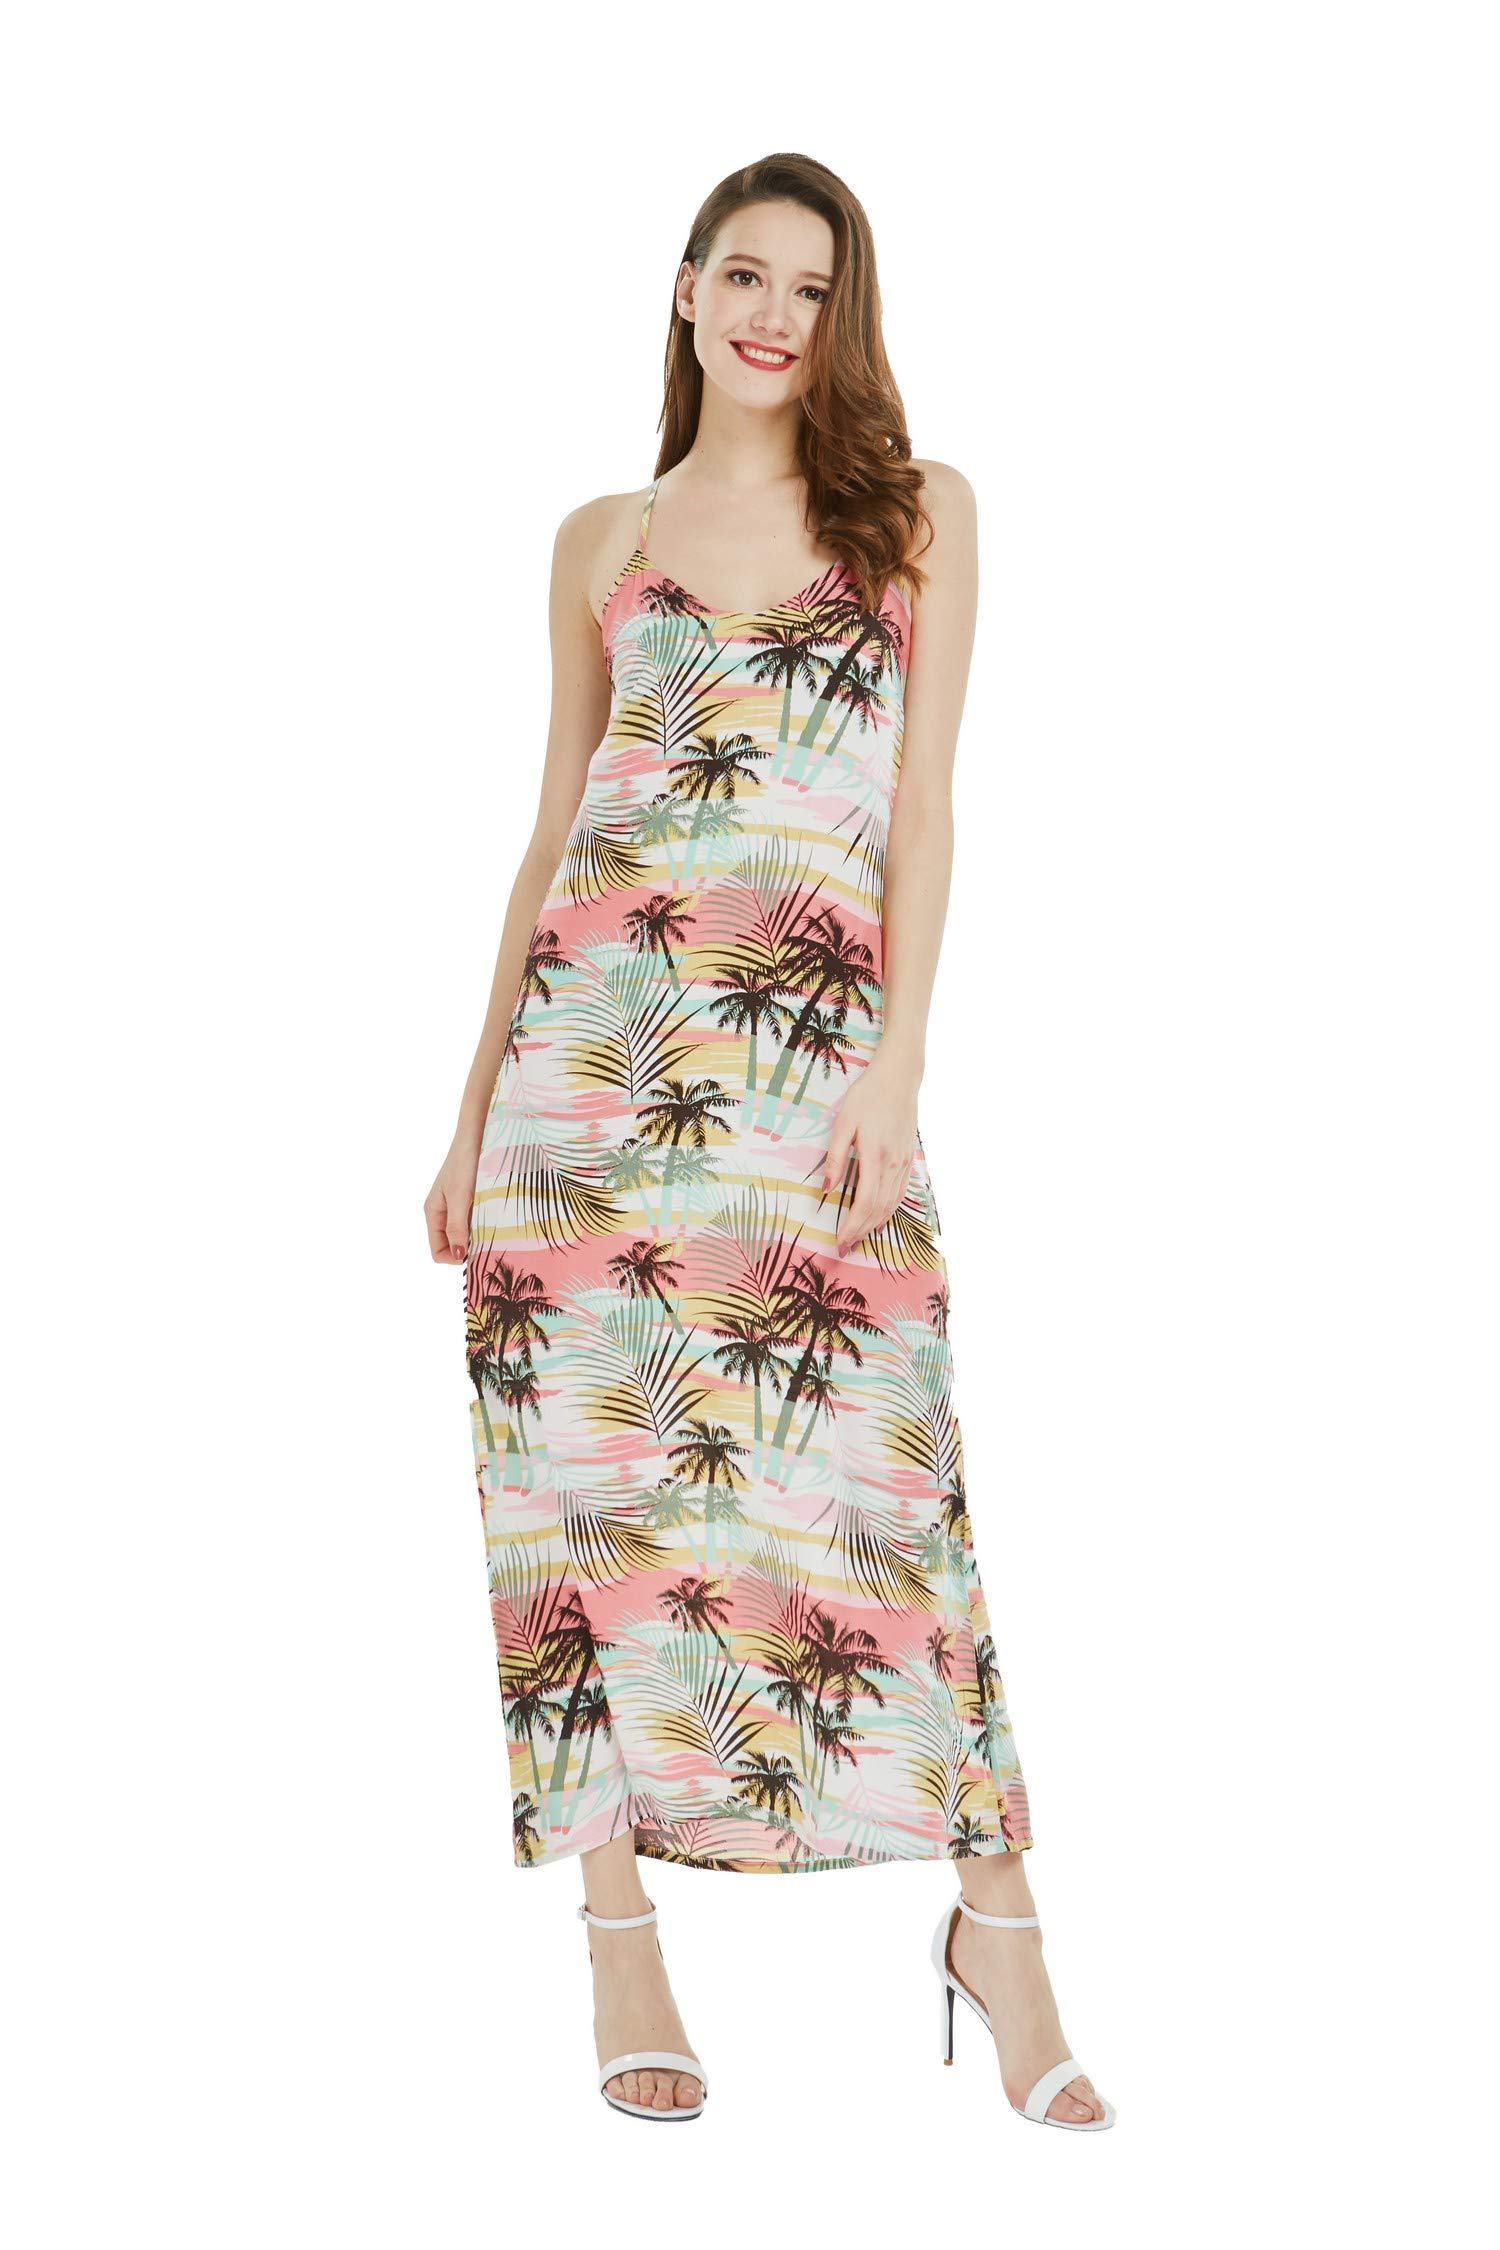 Matching Mother Son Hawaiian Luau Outfit Dress Shirt in Neon Sunset Women M Boy 4 by Hawaii Hangover (Image #2)